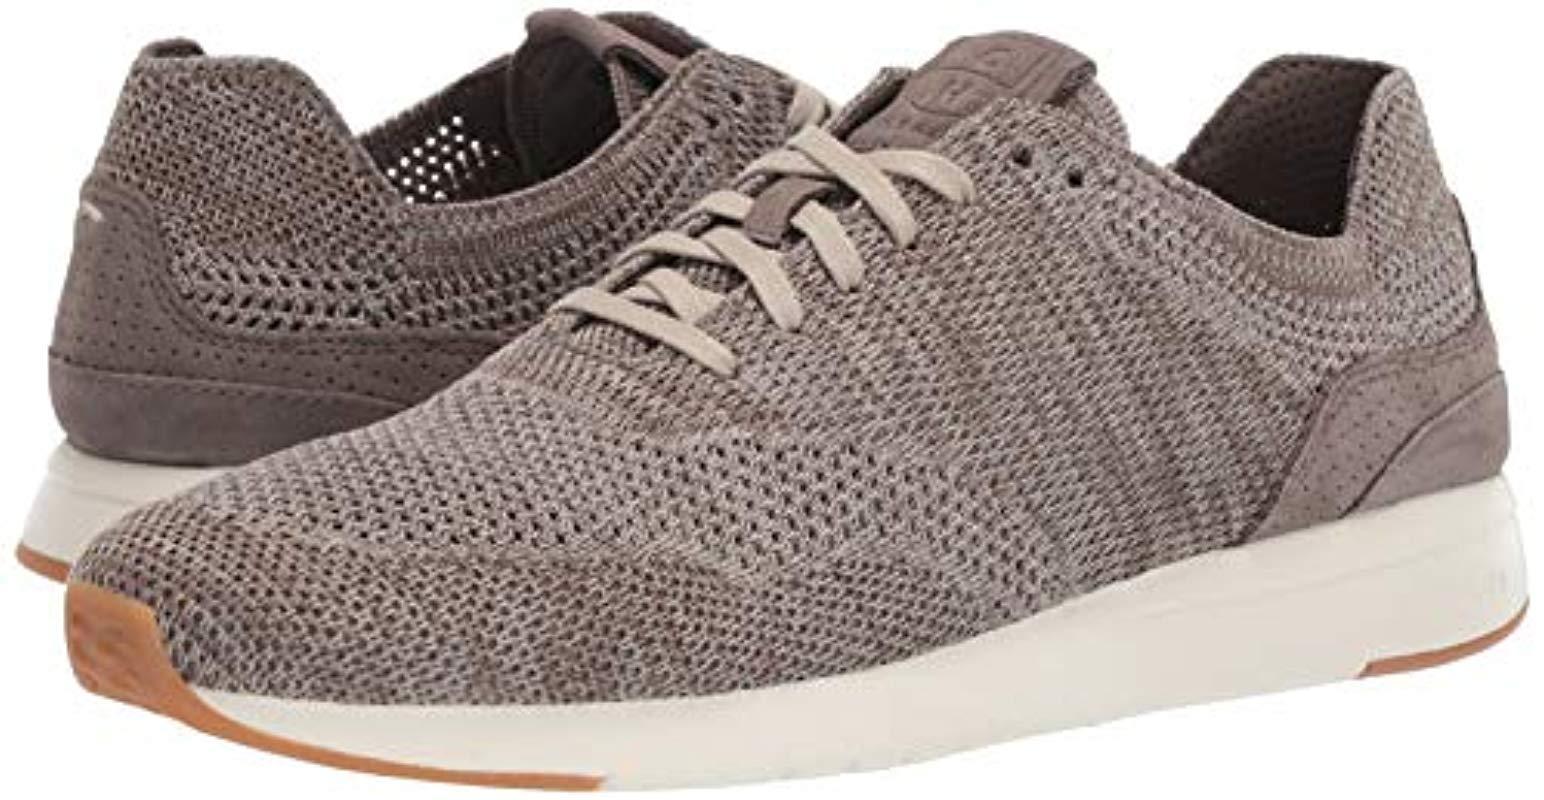 Grandpro Runner Stitchlite Sneaker